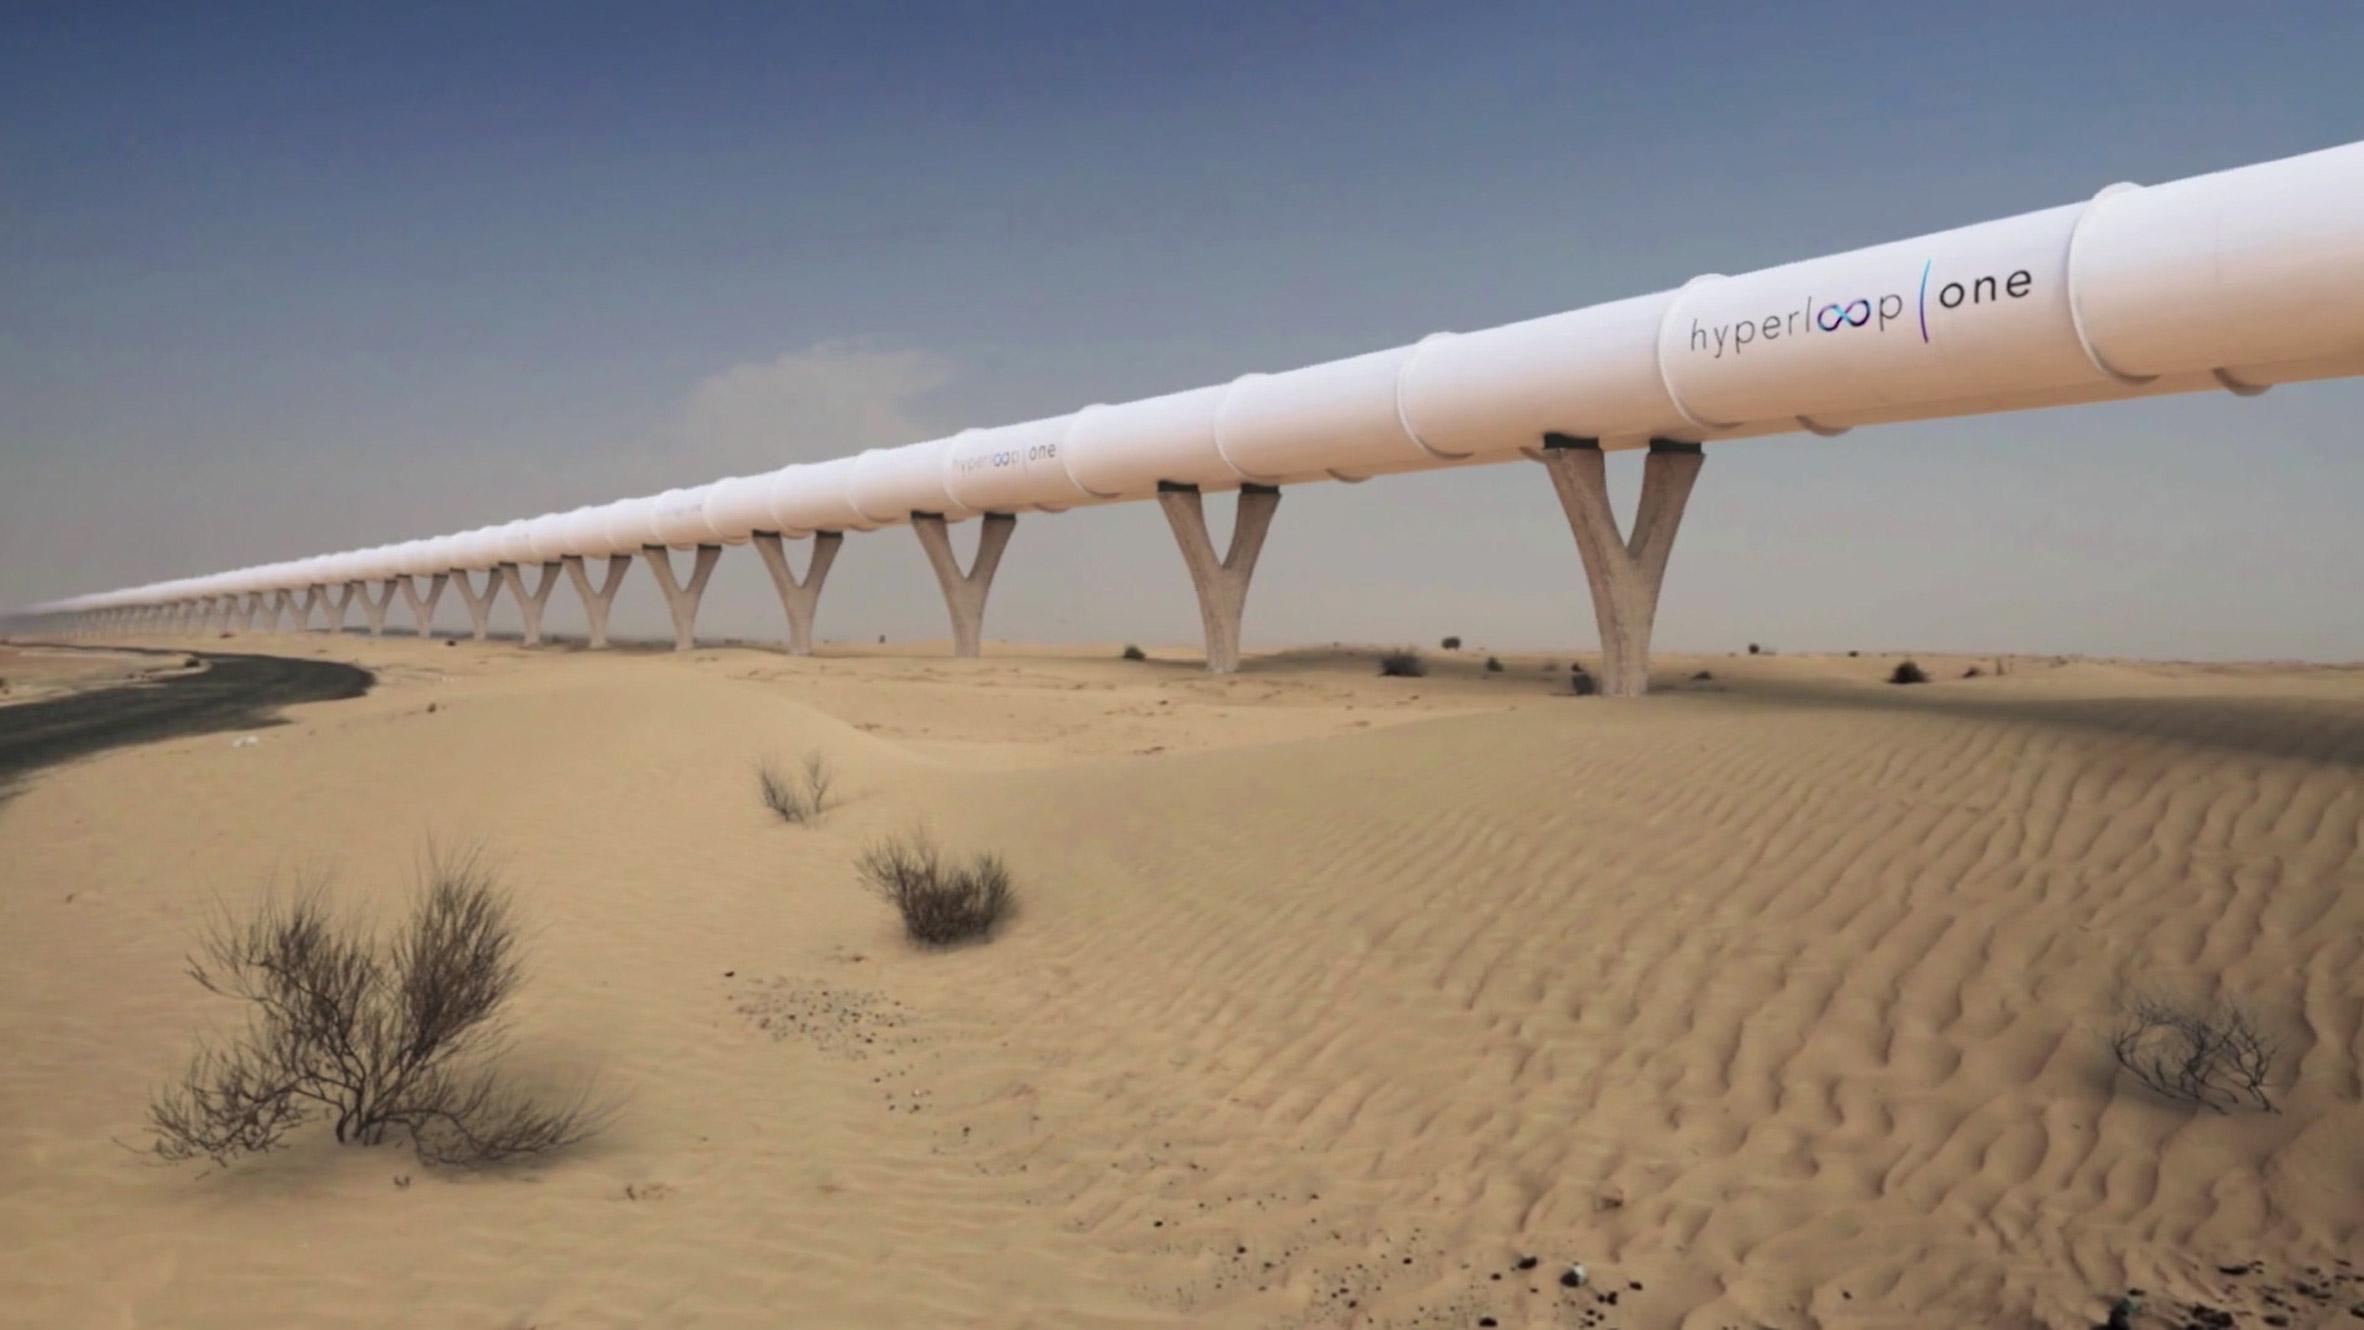 hyperloop-one-big-architects-bjarke-ingels-architecture-design-news-dubai-united-arab-emirates_dezeen_2364_col_1